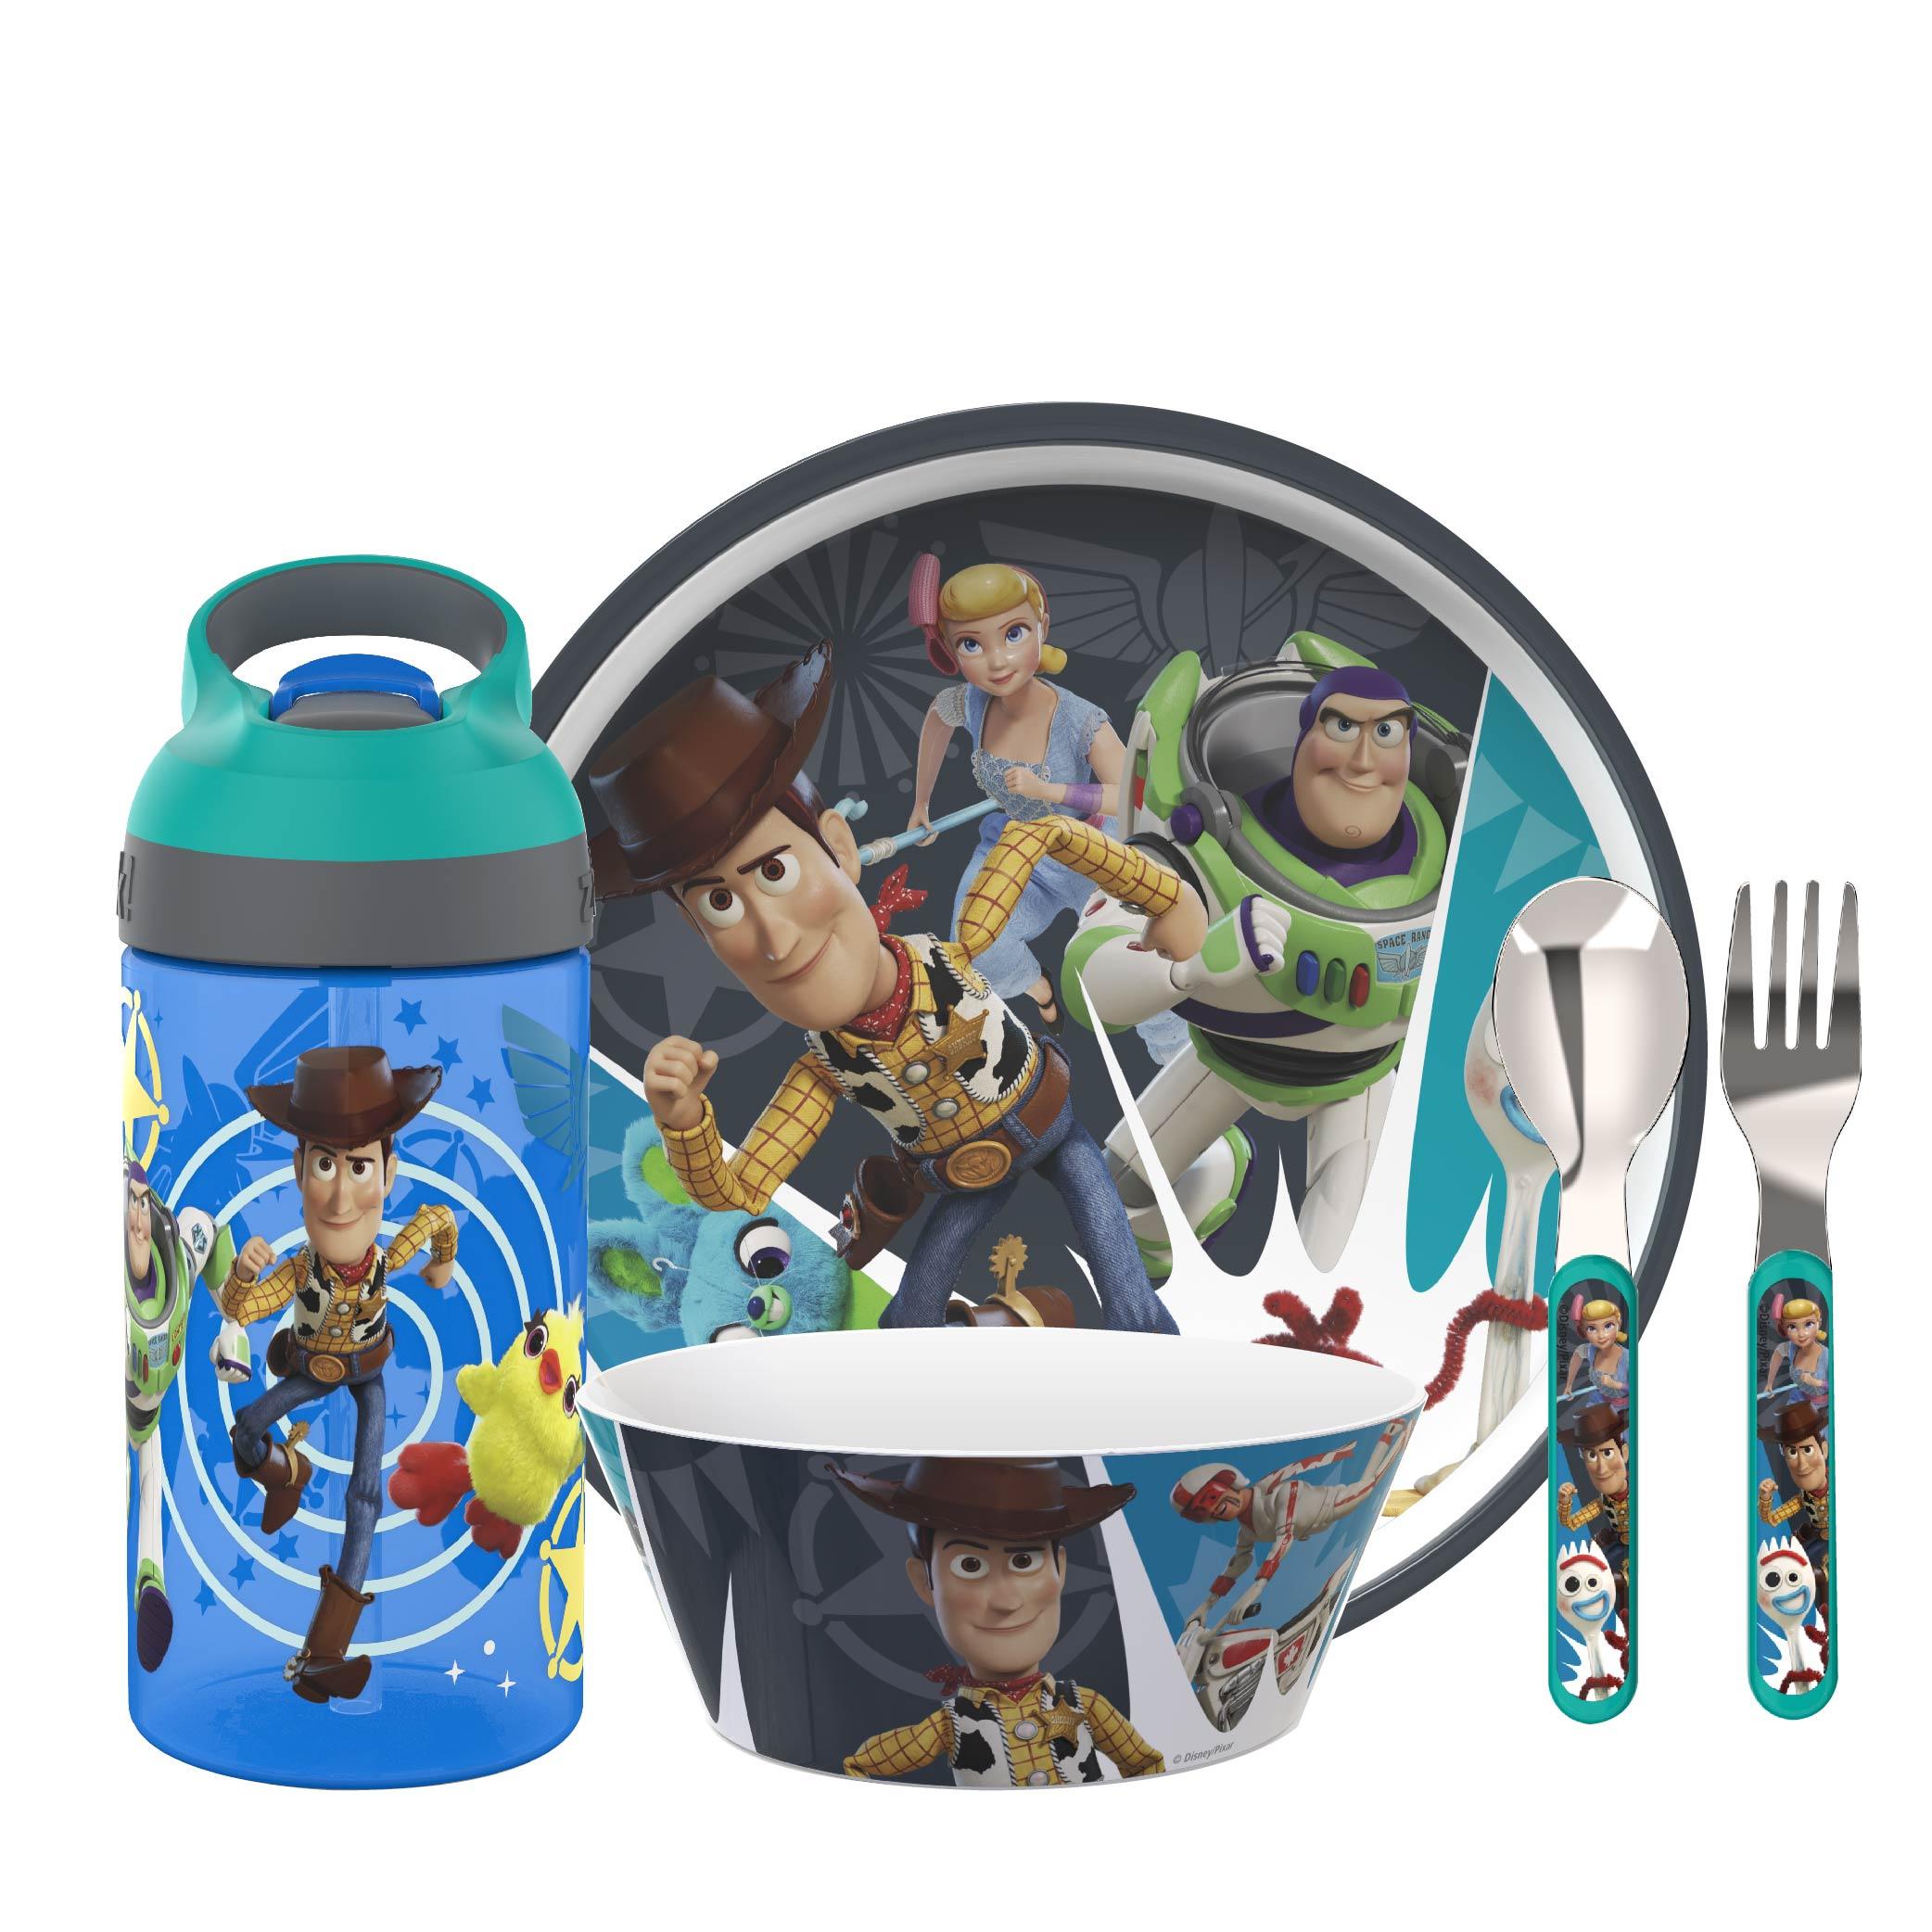 Disney Pixar Dinnerware Set, Toy Story 4, 5-piece set slideshow image 2